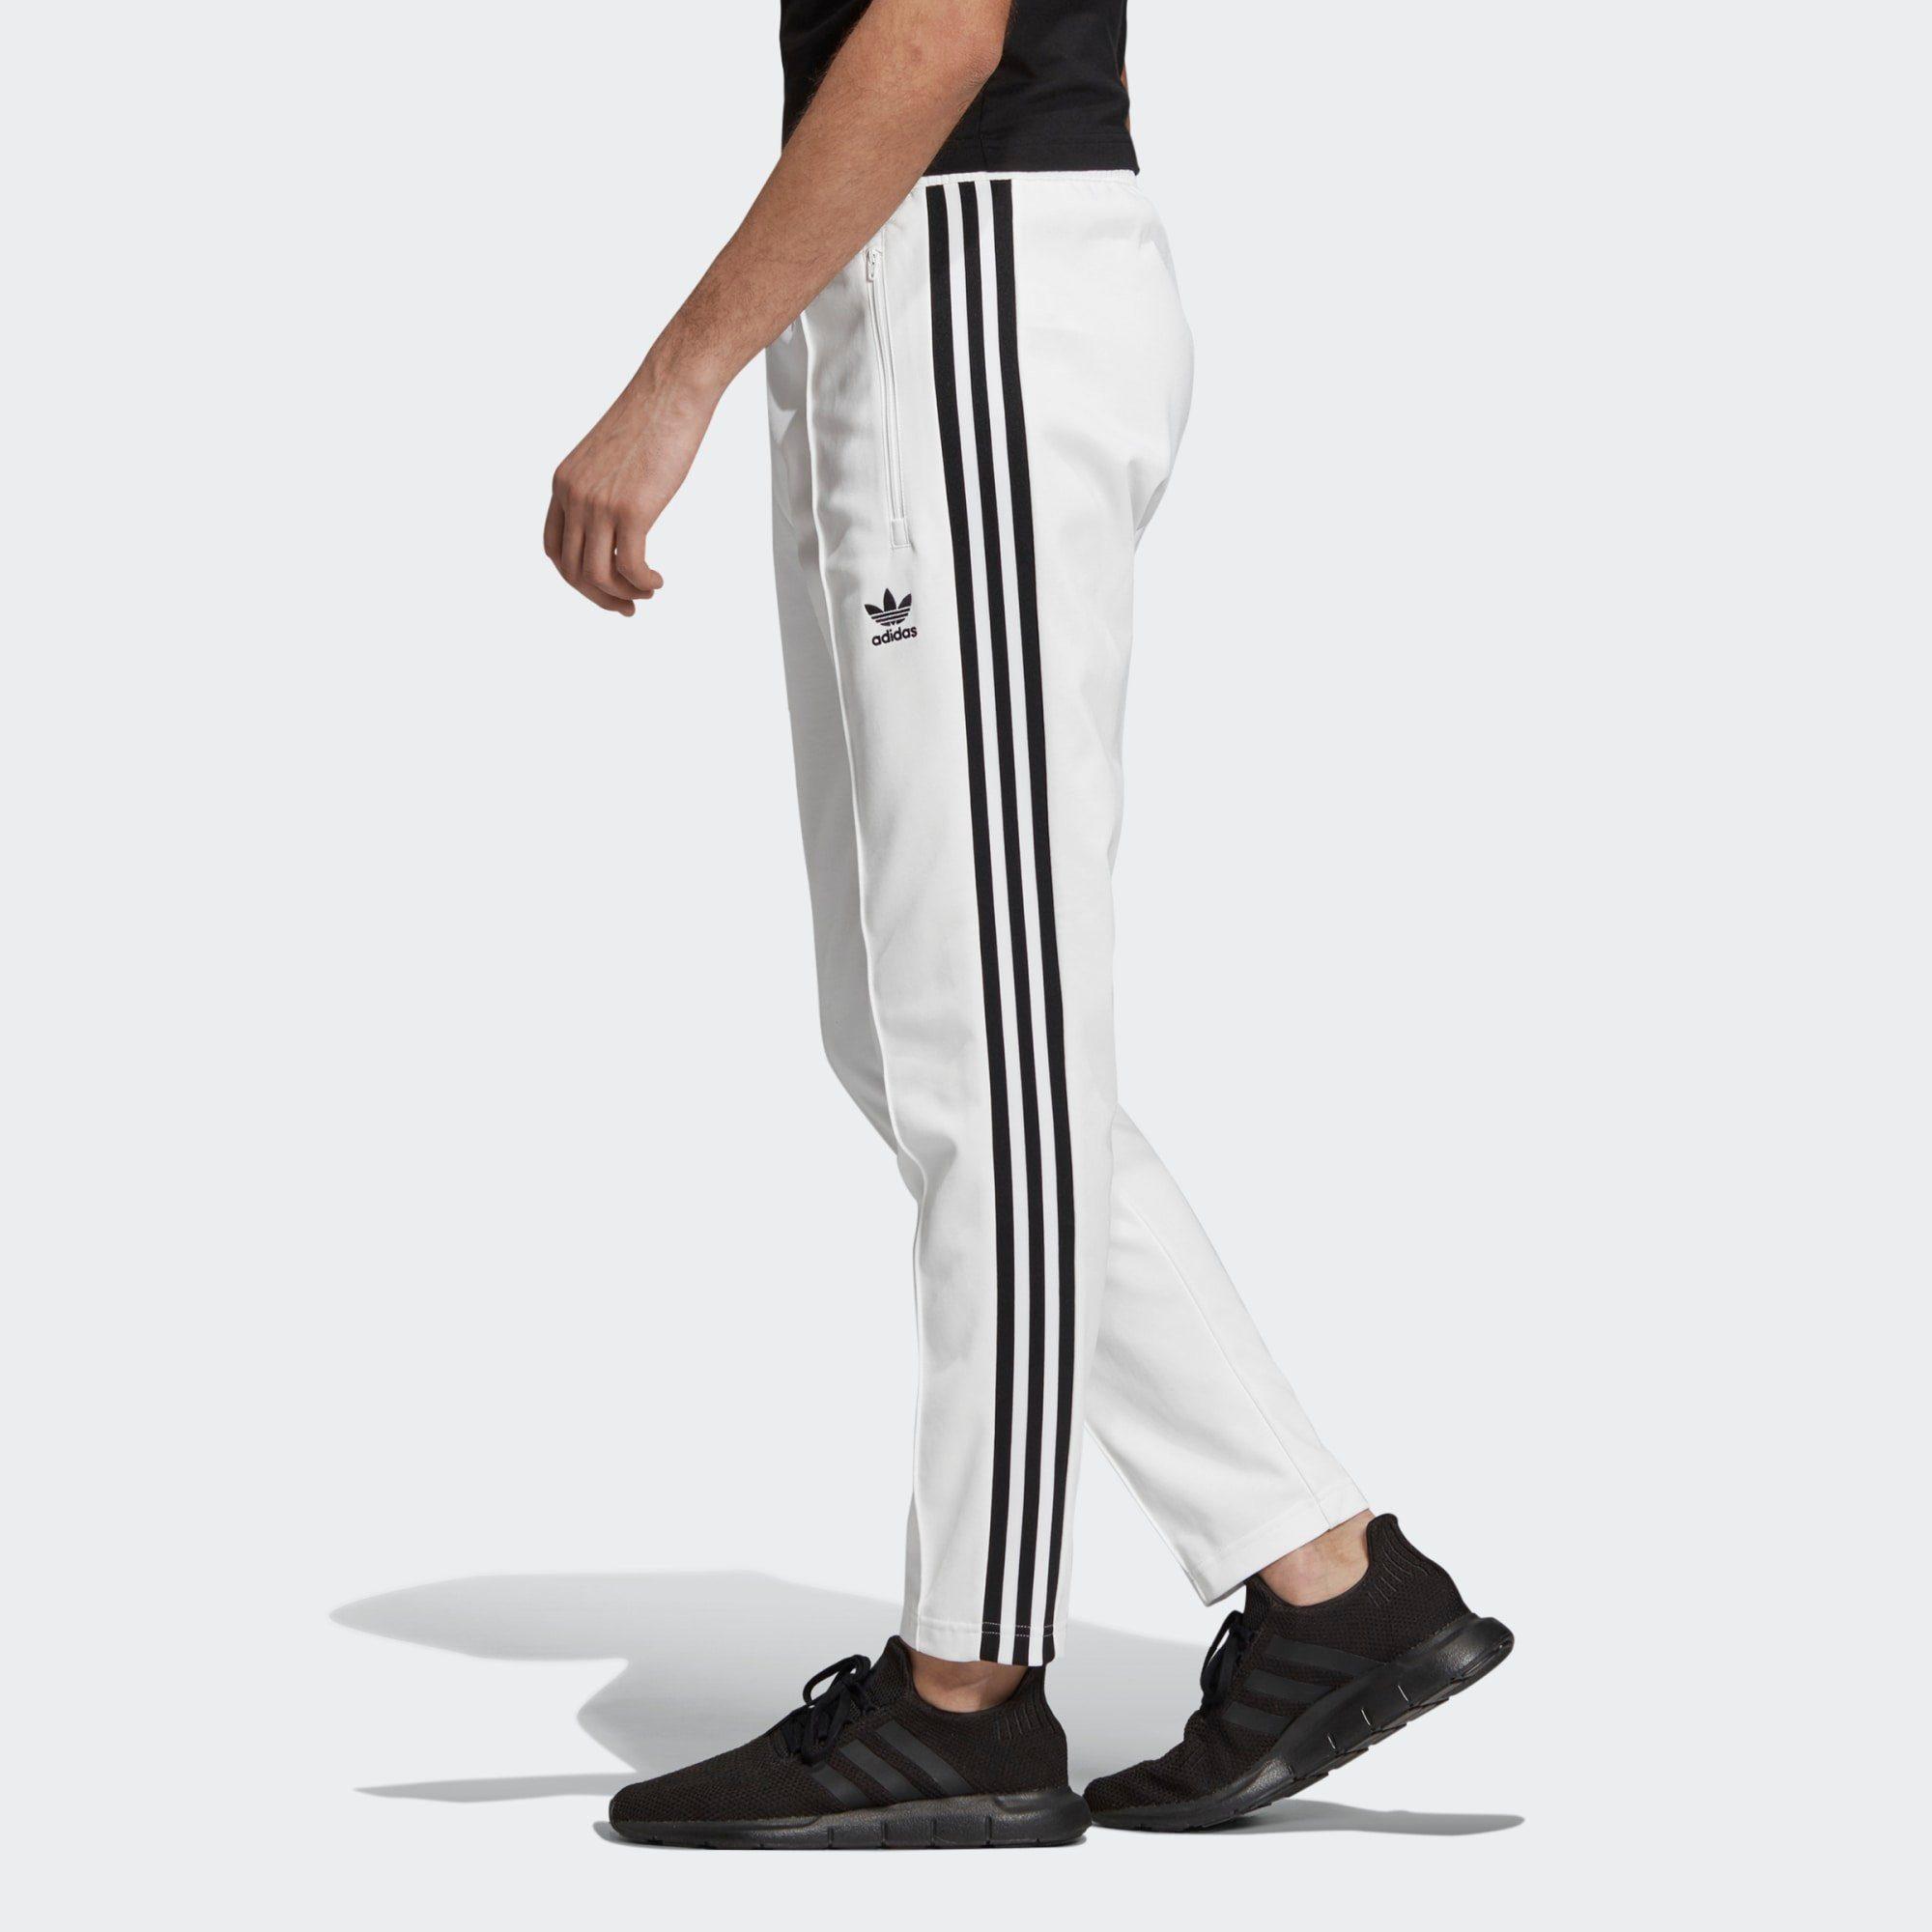 ADIDAS ORIGINALS BB Trainingshose Herren Pants;Tracksuits